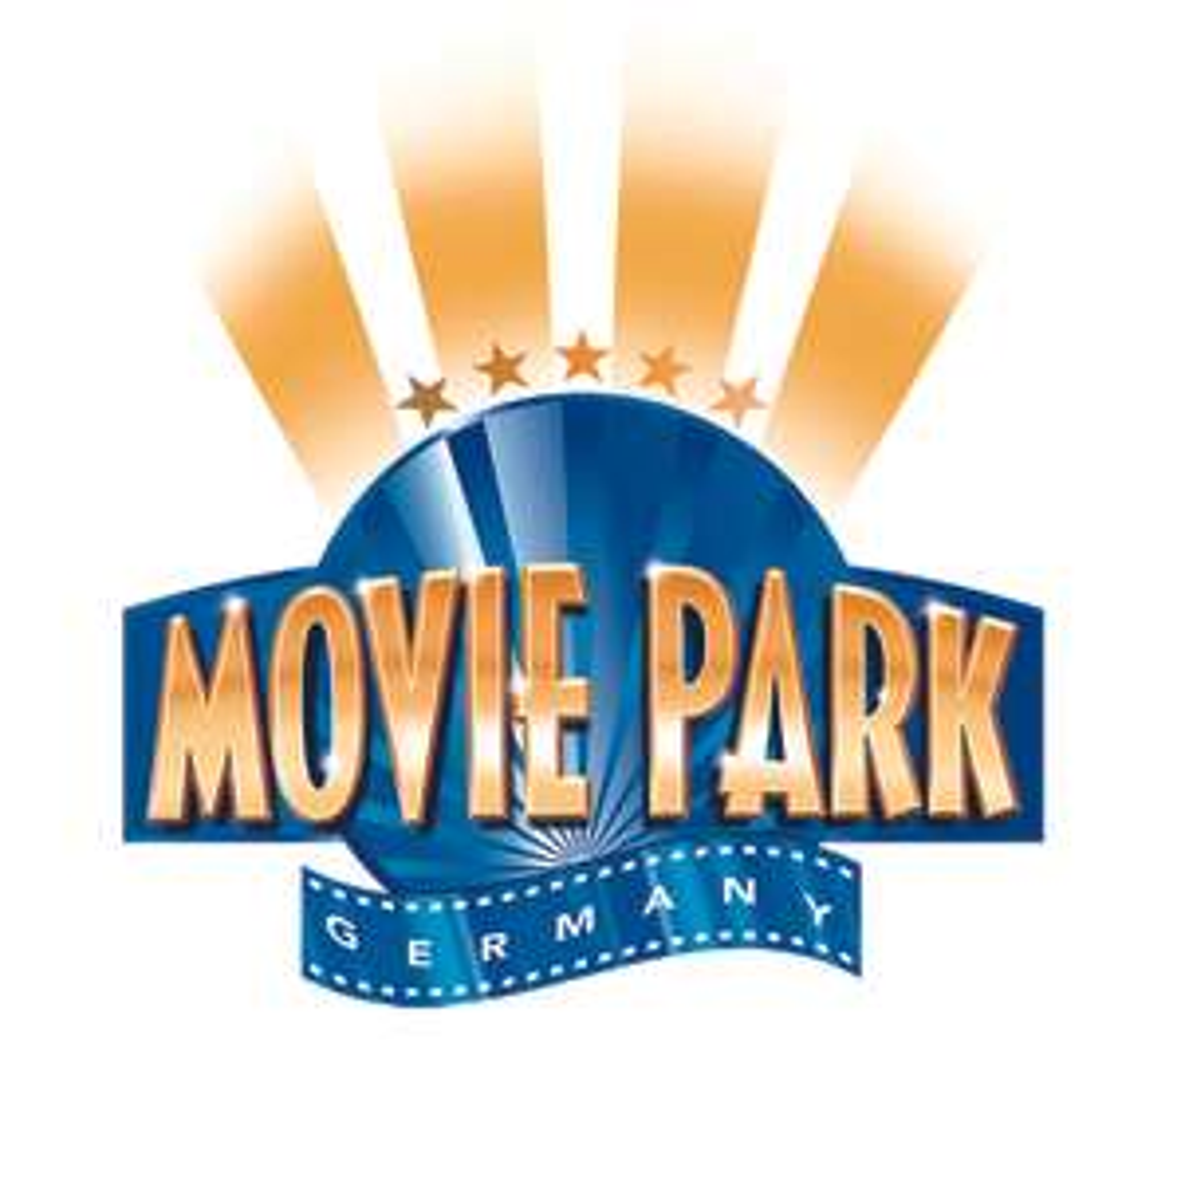 Movie Park Tagesticket inkl. Burger-Menü für 15€ bei Groupon